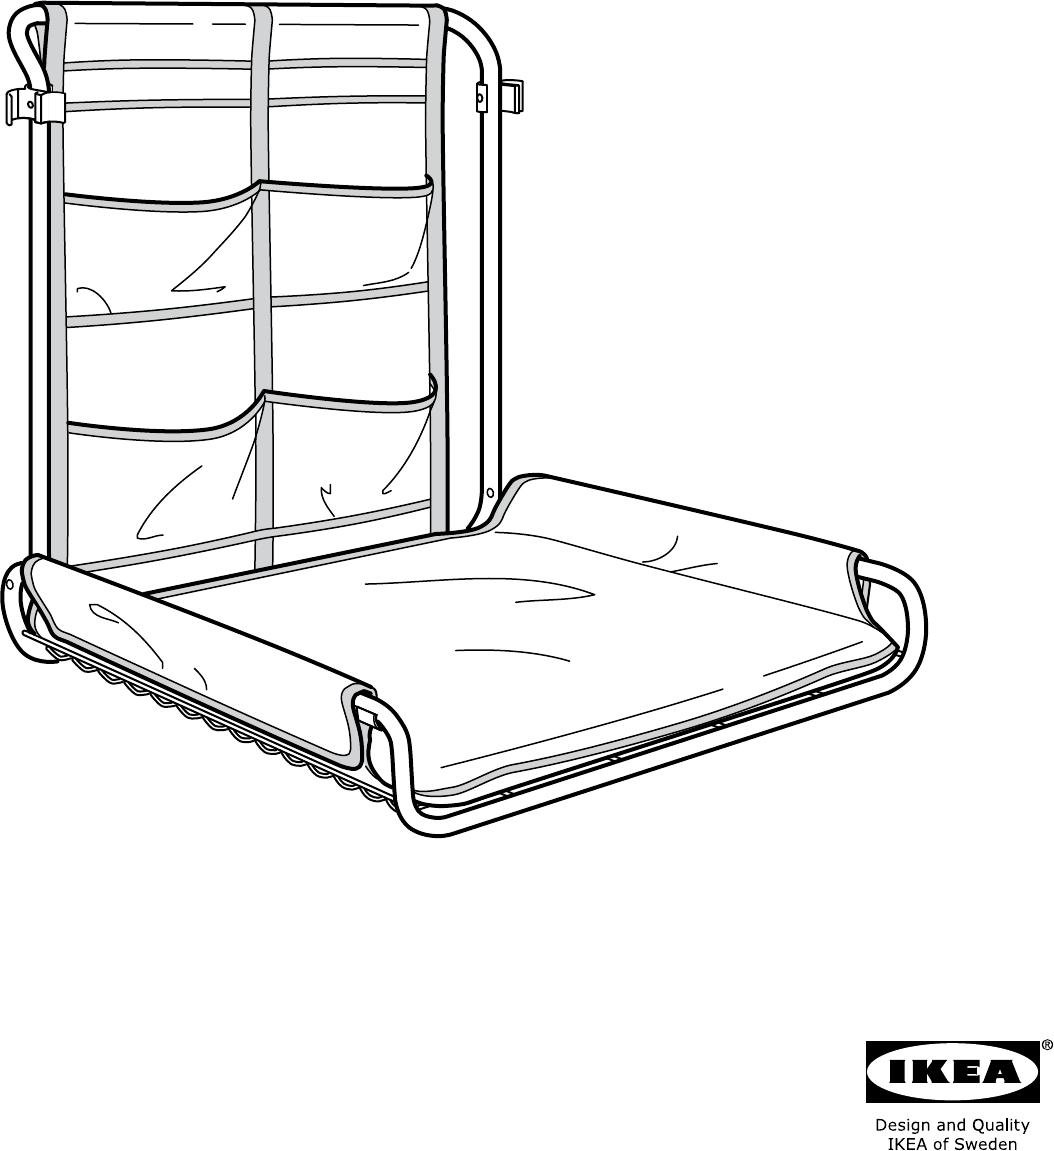 handleiding ikea antilop wandcommode pagina 1 van 12. Black Bedroom Furniture Sets. Home Design Ideas